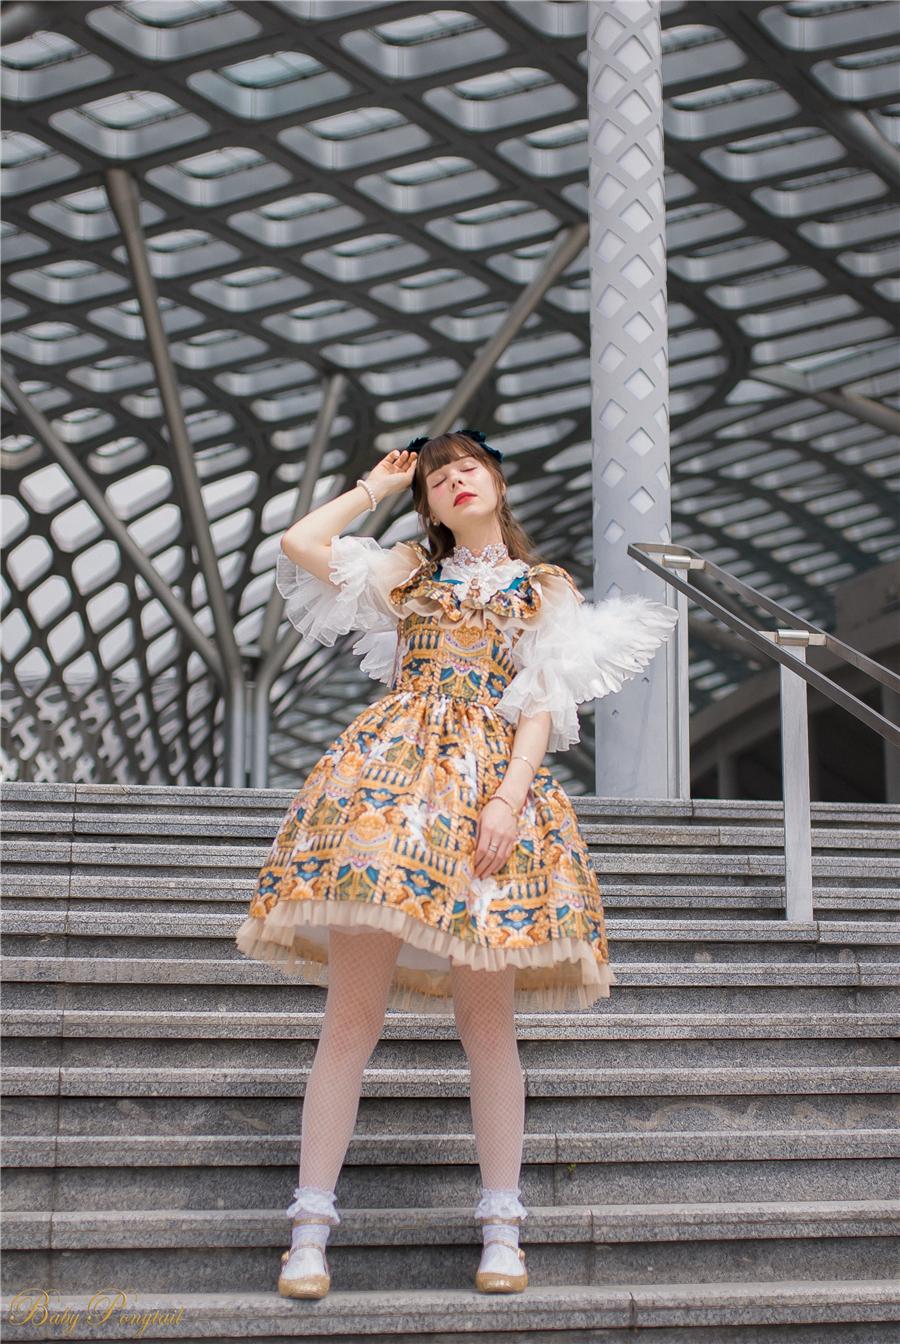 Babyponytail_Model_Ruffle Collar JSK_Tiel Angel_2_Claudia_6.jpg